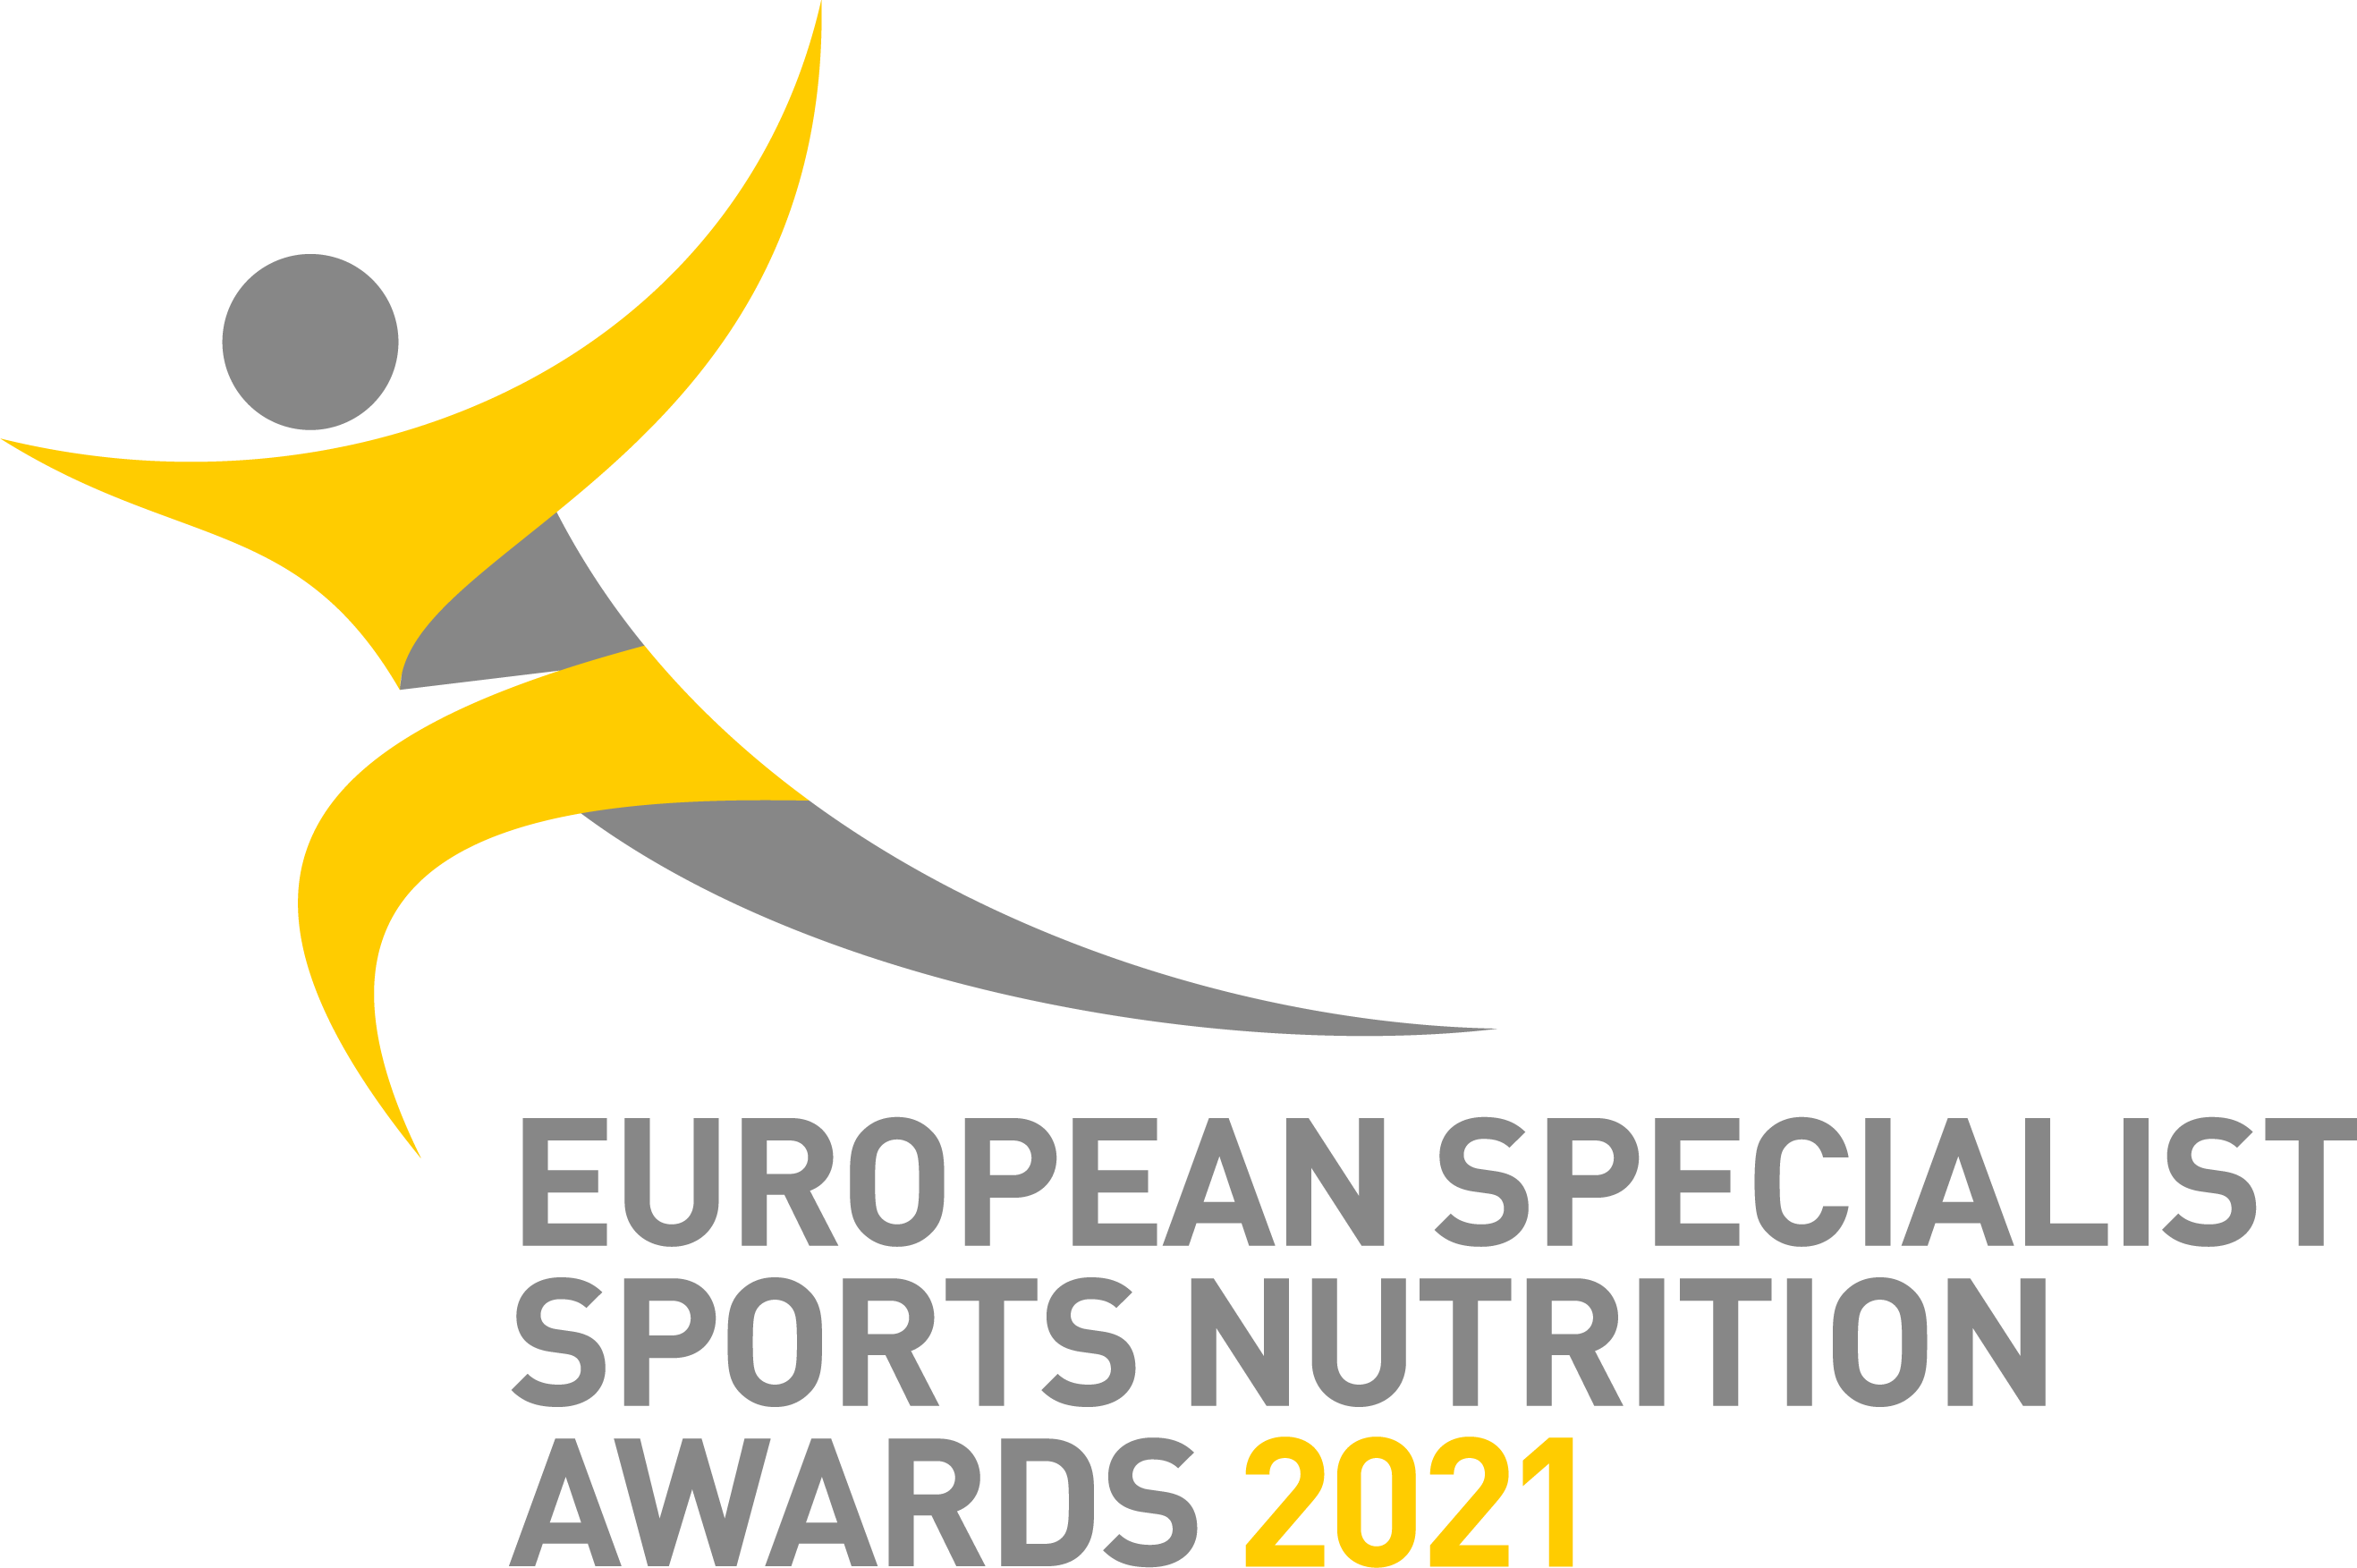 awards logo 2021